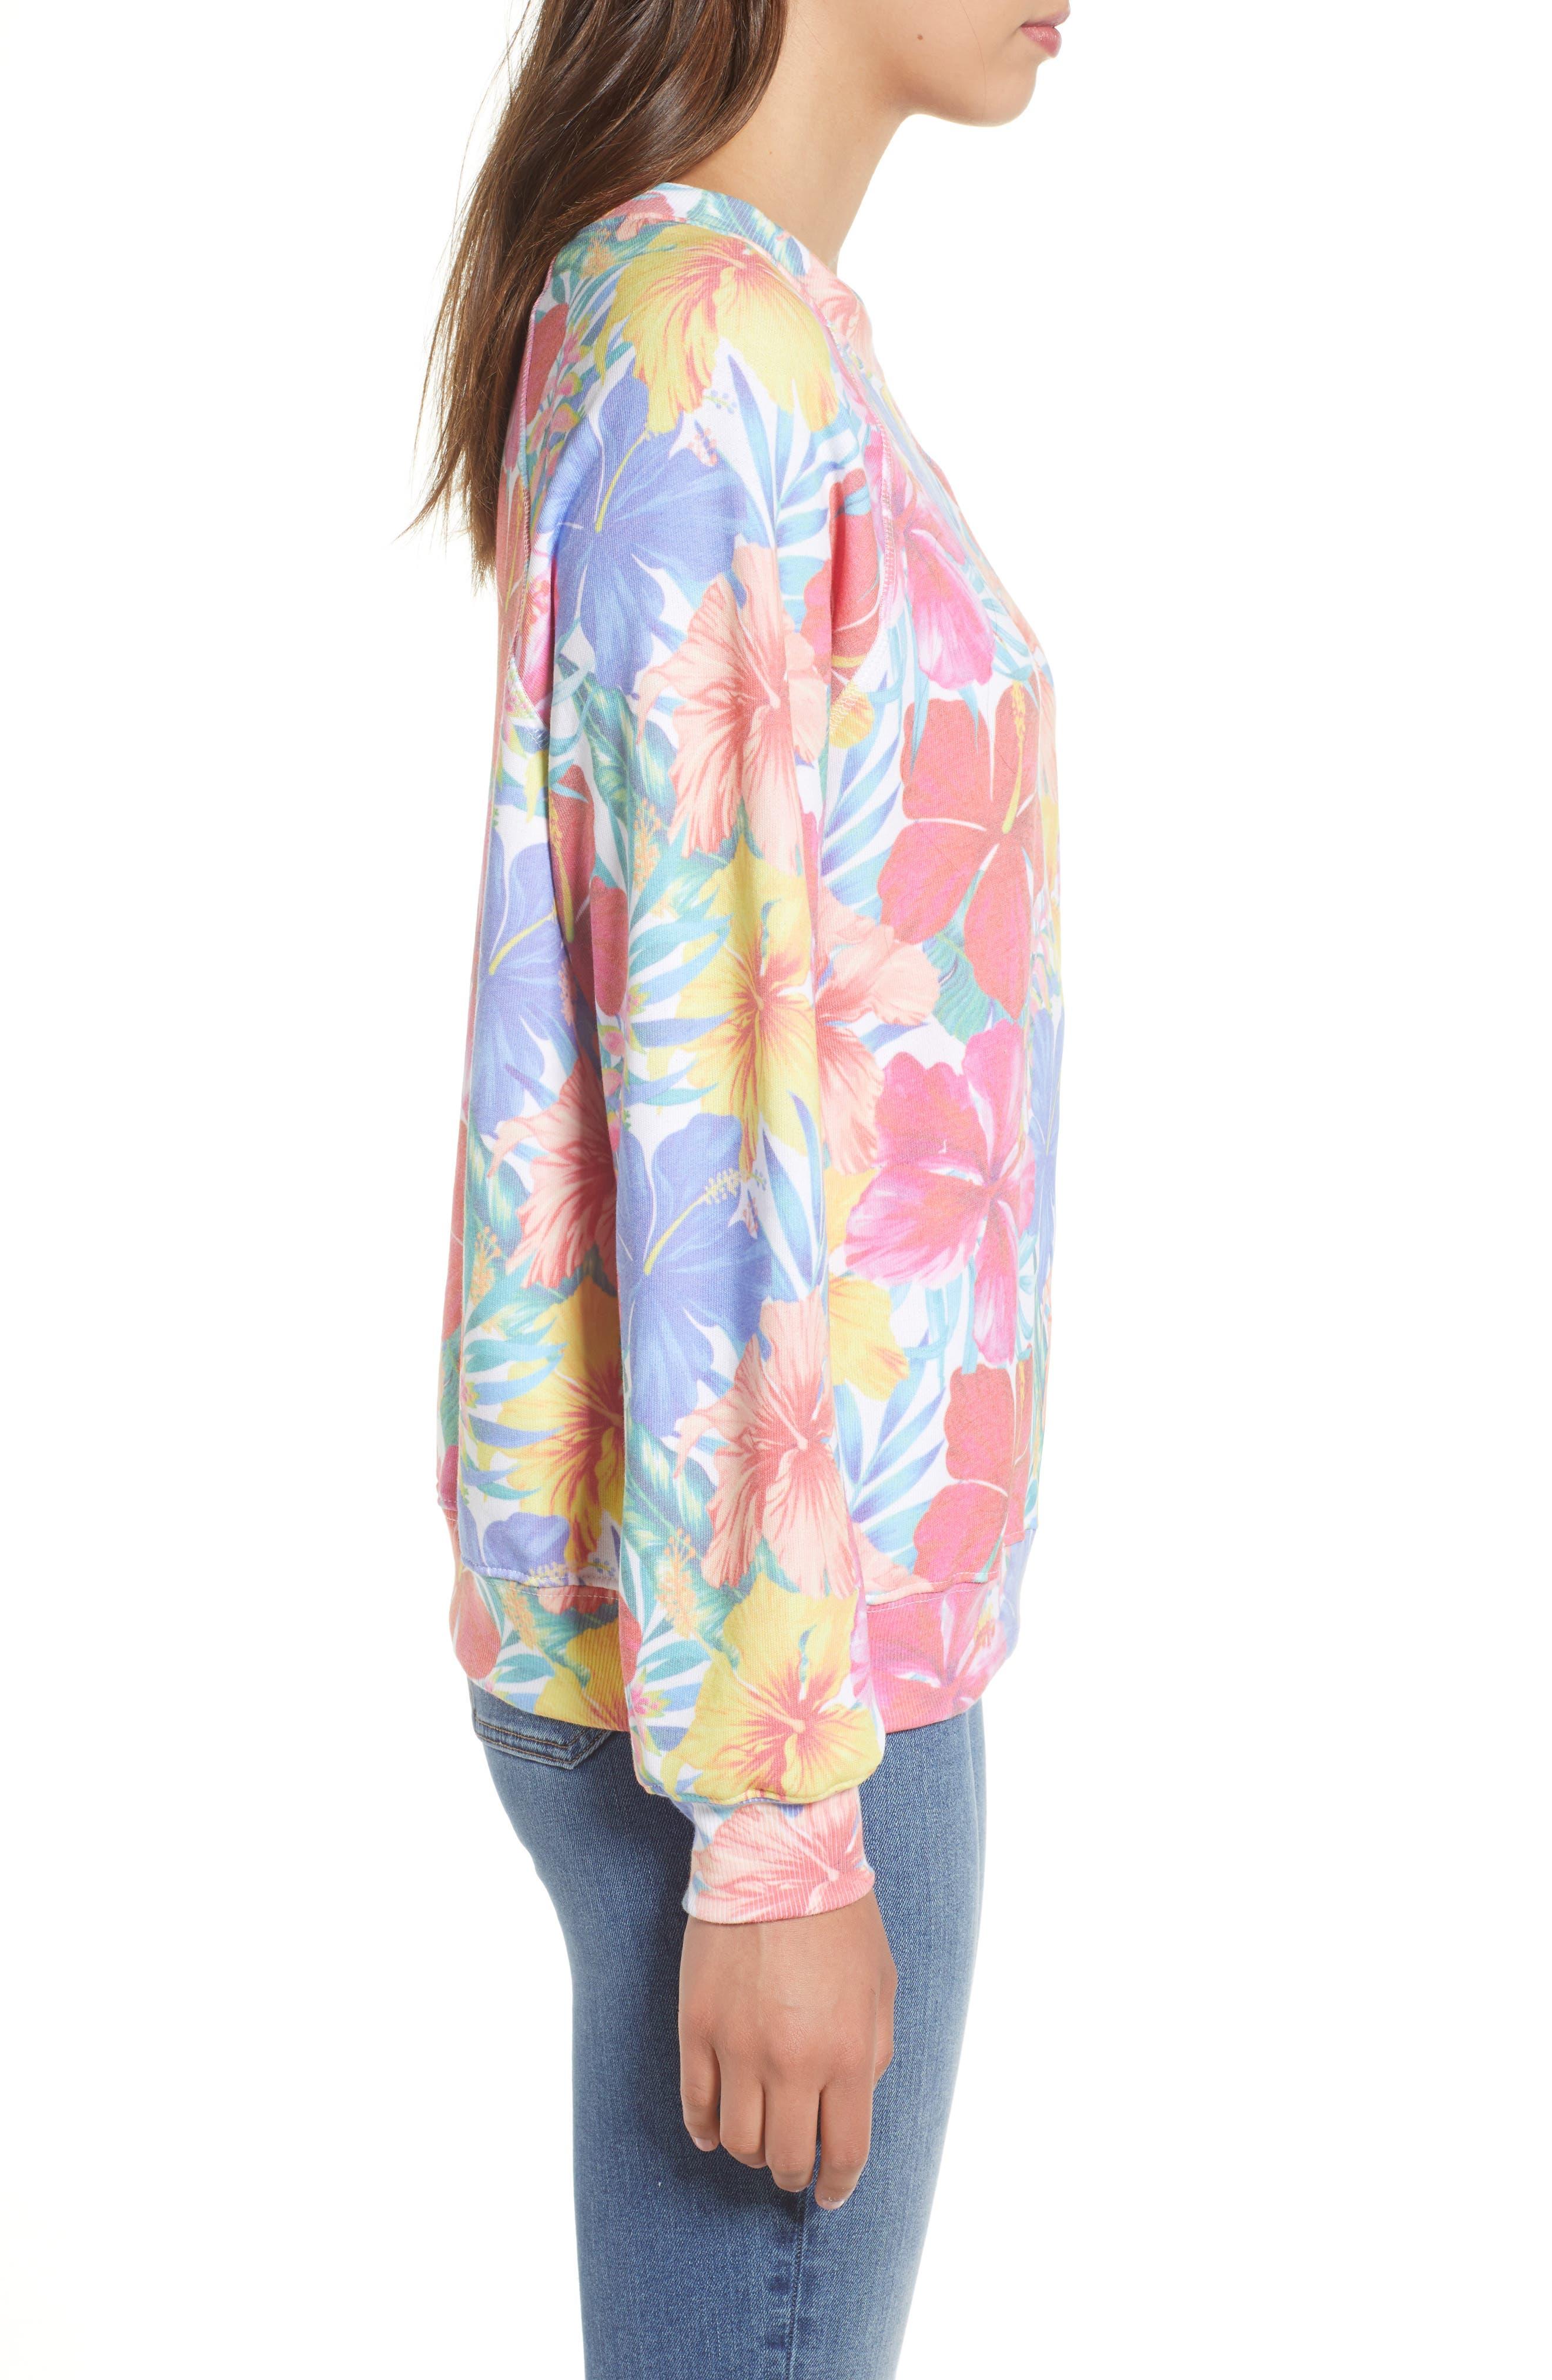 Tropicalia Sommers Sweatshirt,                             Alternate thumbnail 3, color,                             Multi Colored